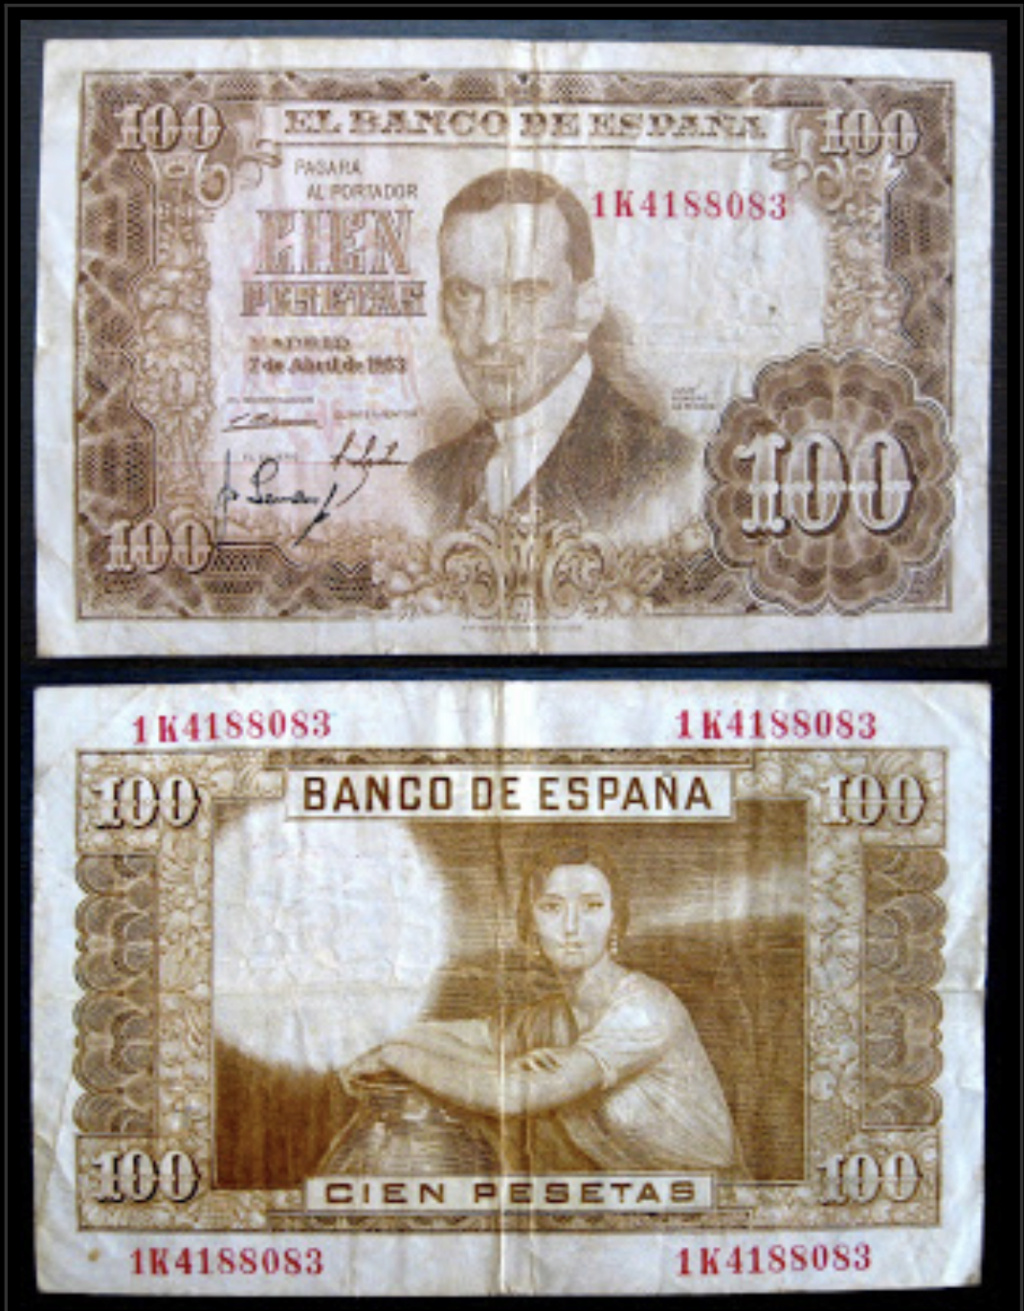 Investigación - Billetes de 100 pts 1953 Romero de Torres Captur23